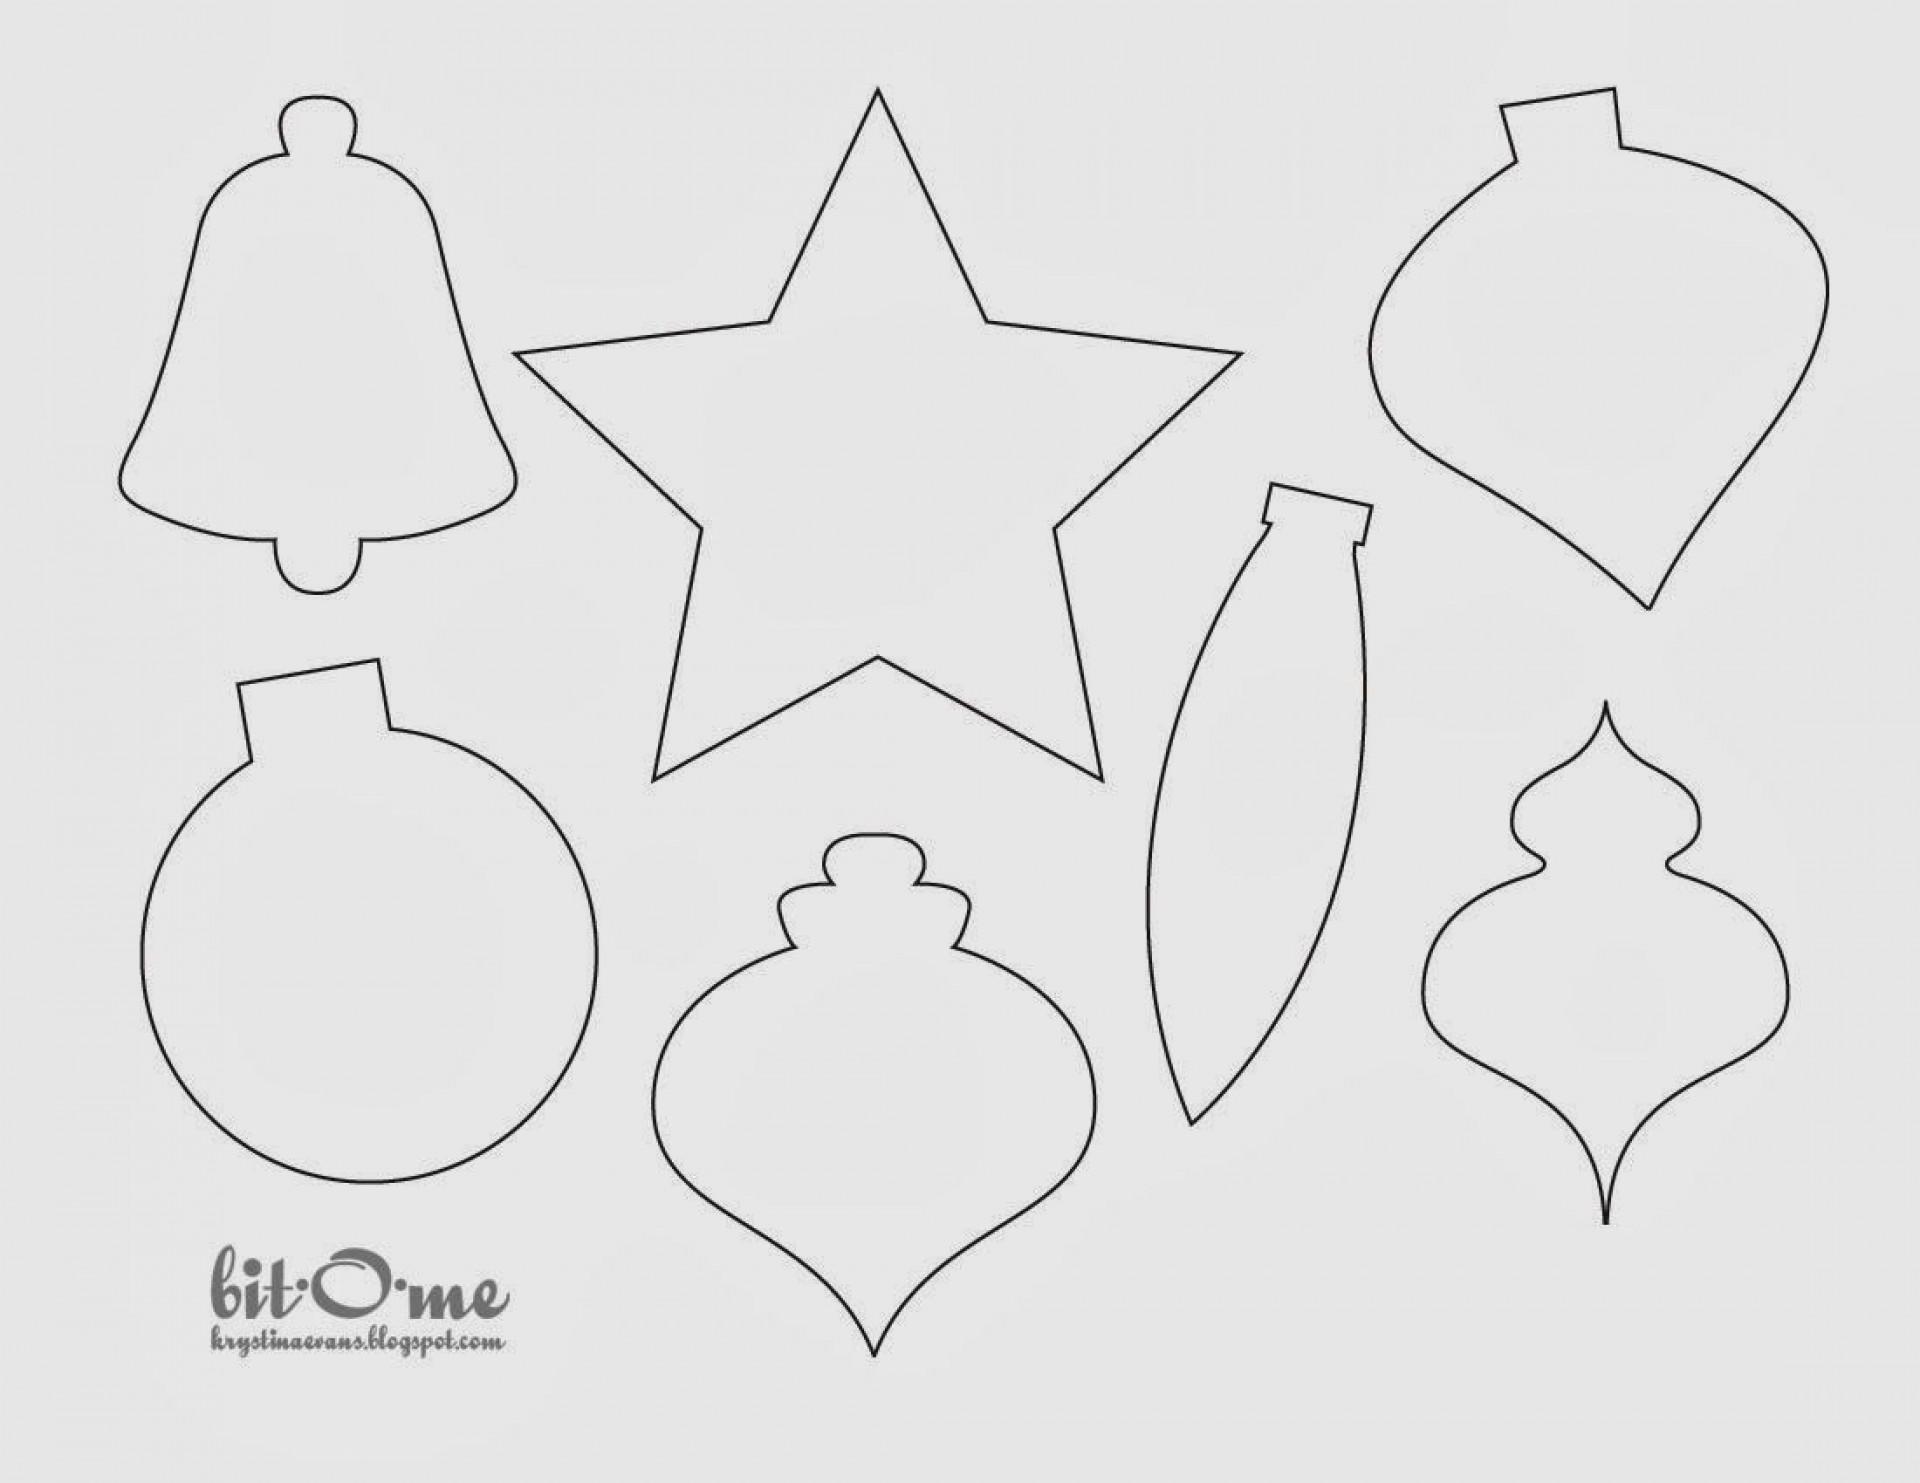 008 Fantastic Printable Christma Ornament Template Picture  Templates Stencil Felt Pattern Tree1920